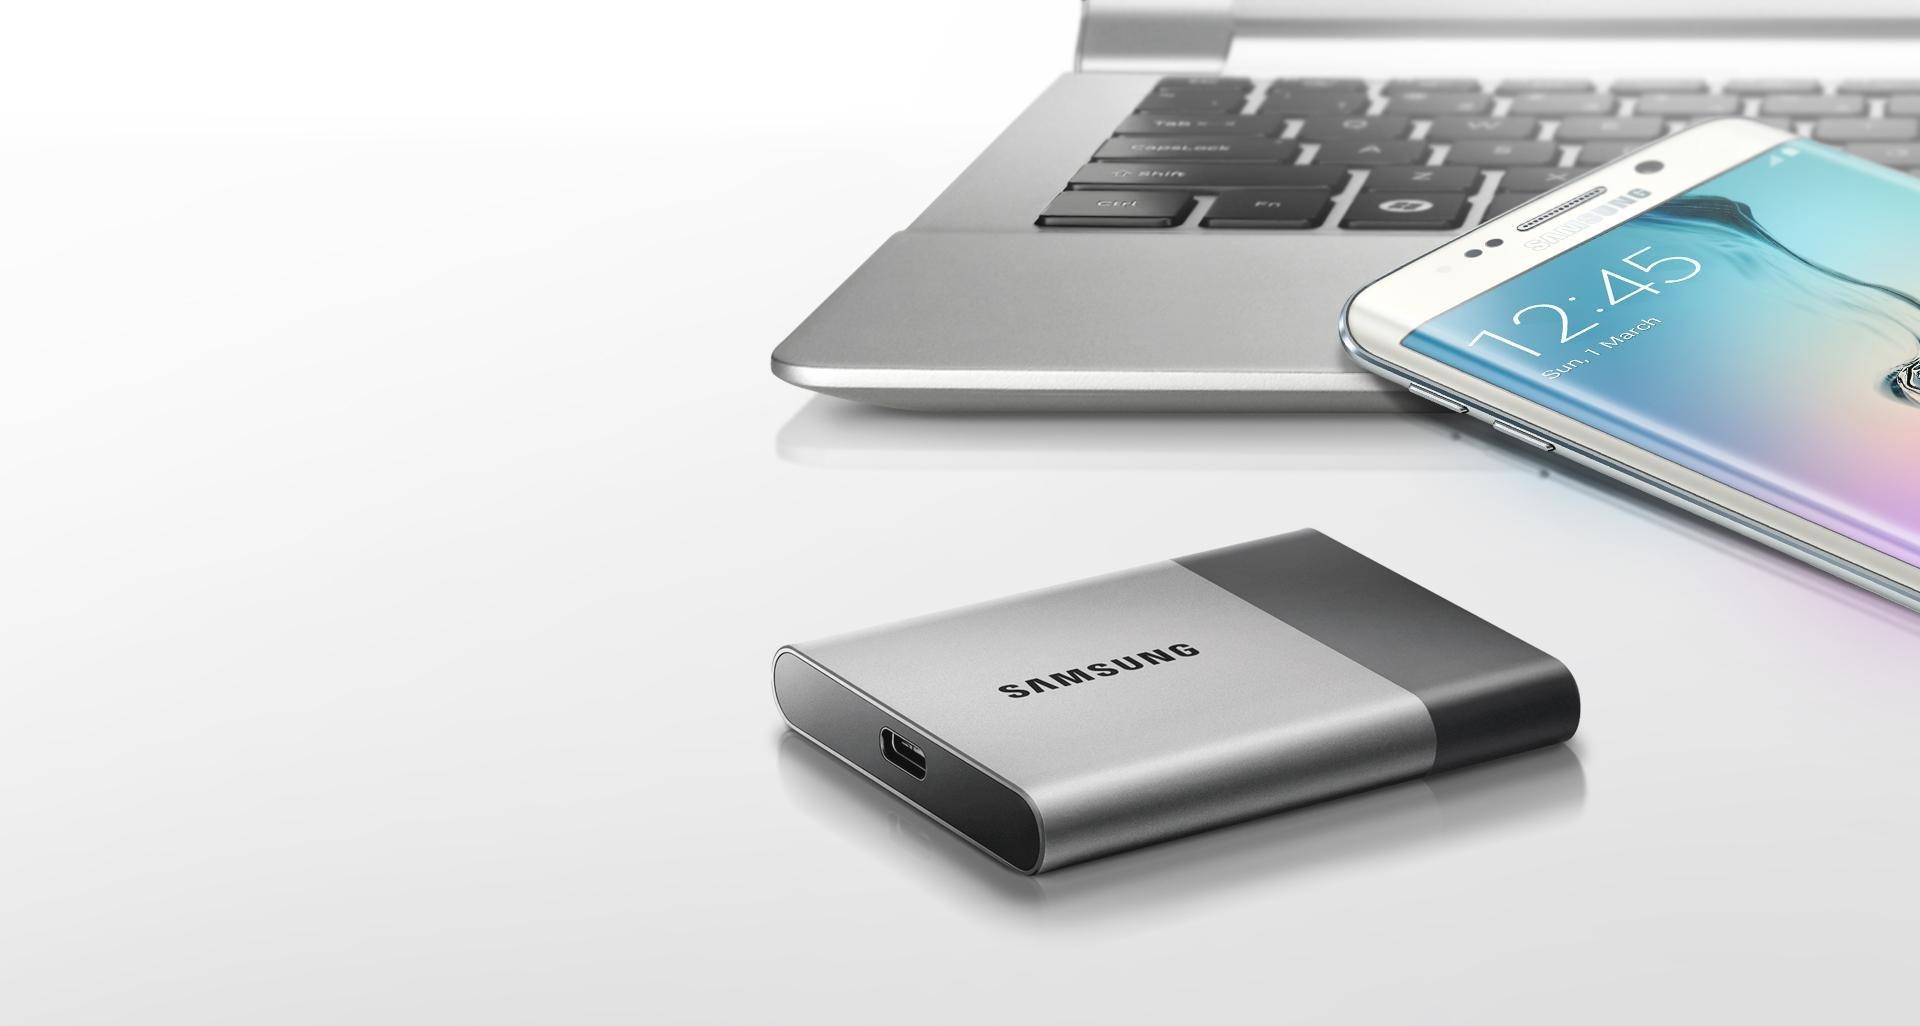 Samsung T3 Portable SSD - 250GB - USB 3.1 External SSD (MU-PT250B/AM) (Renewed) by Samsung (Image #2)